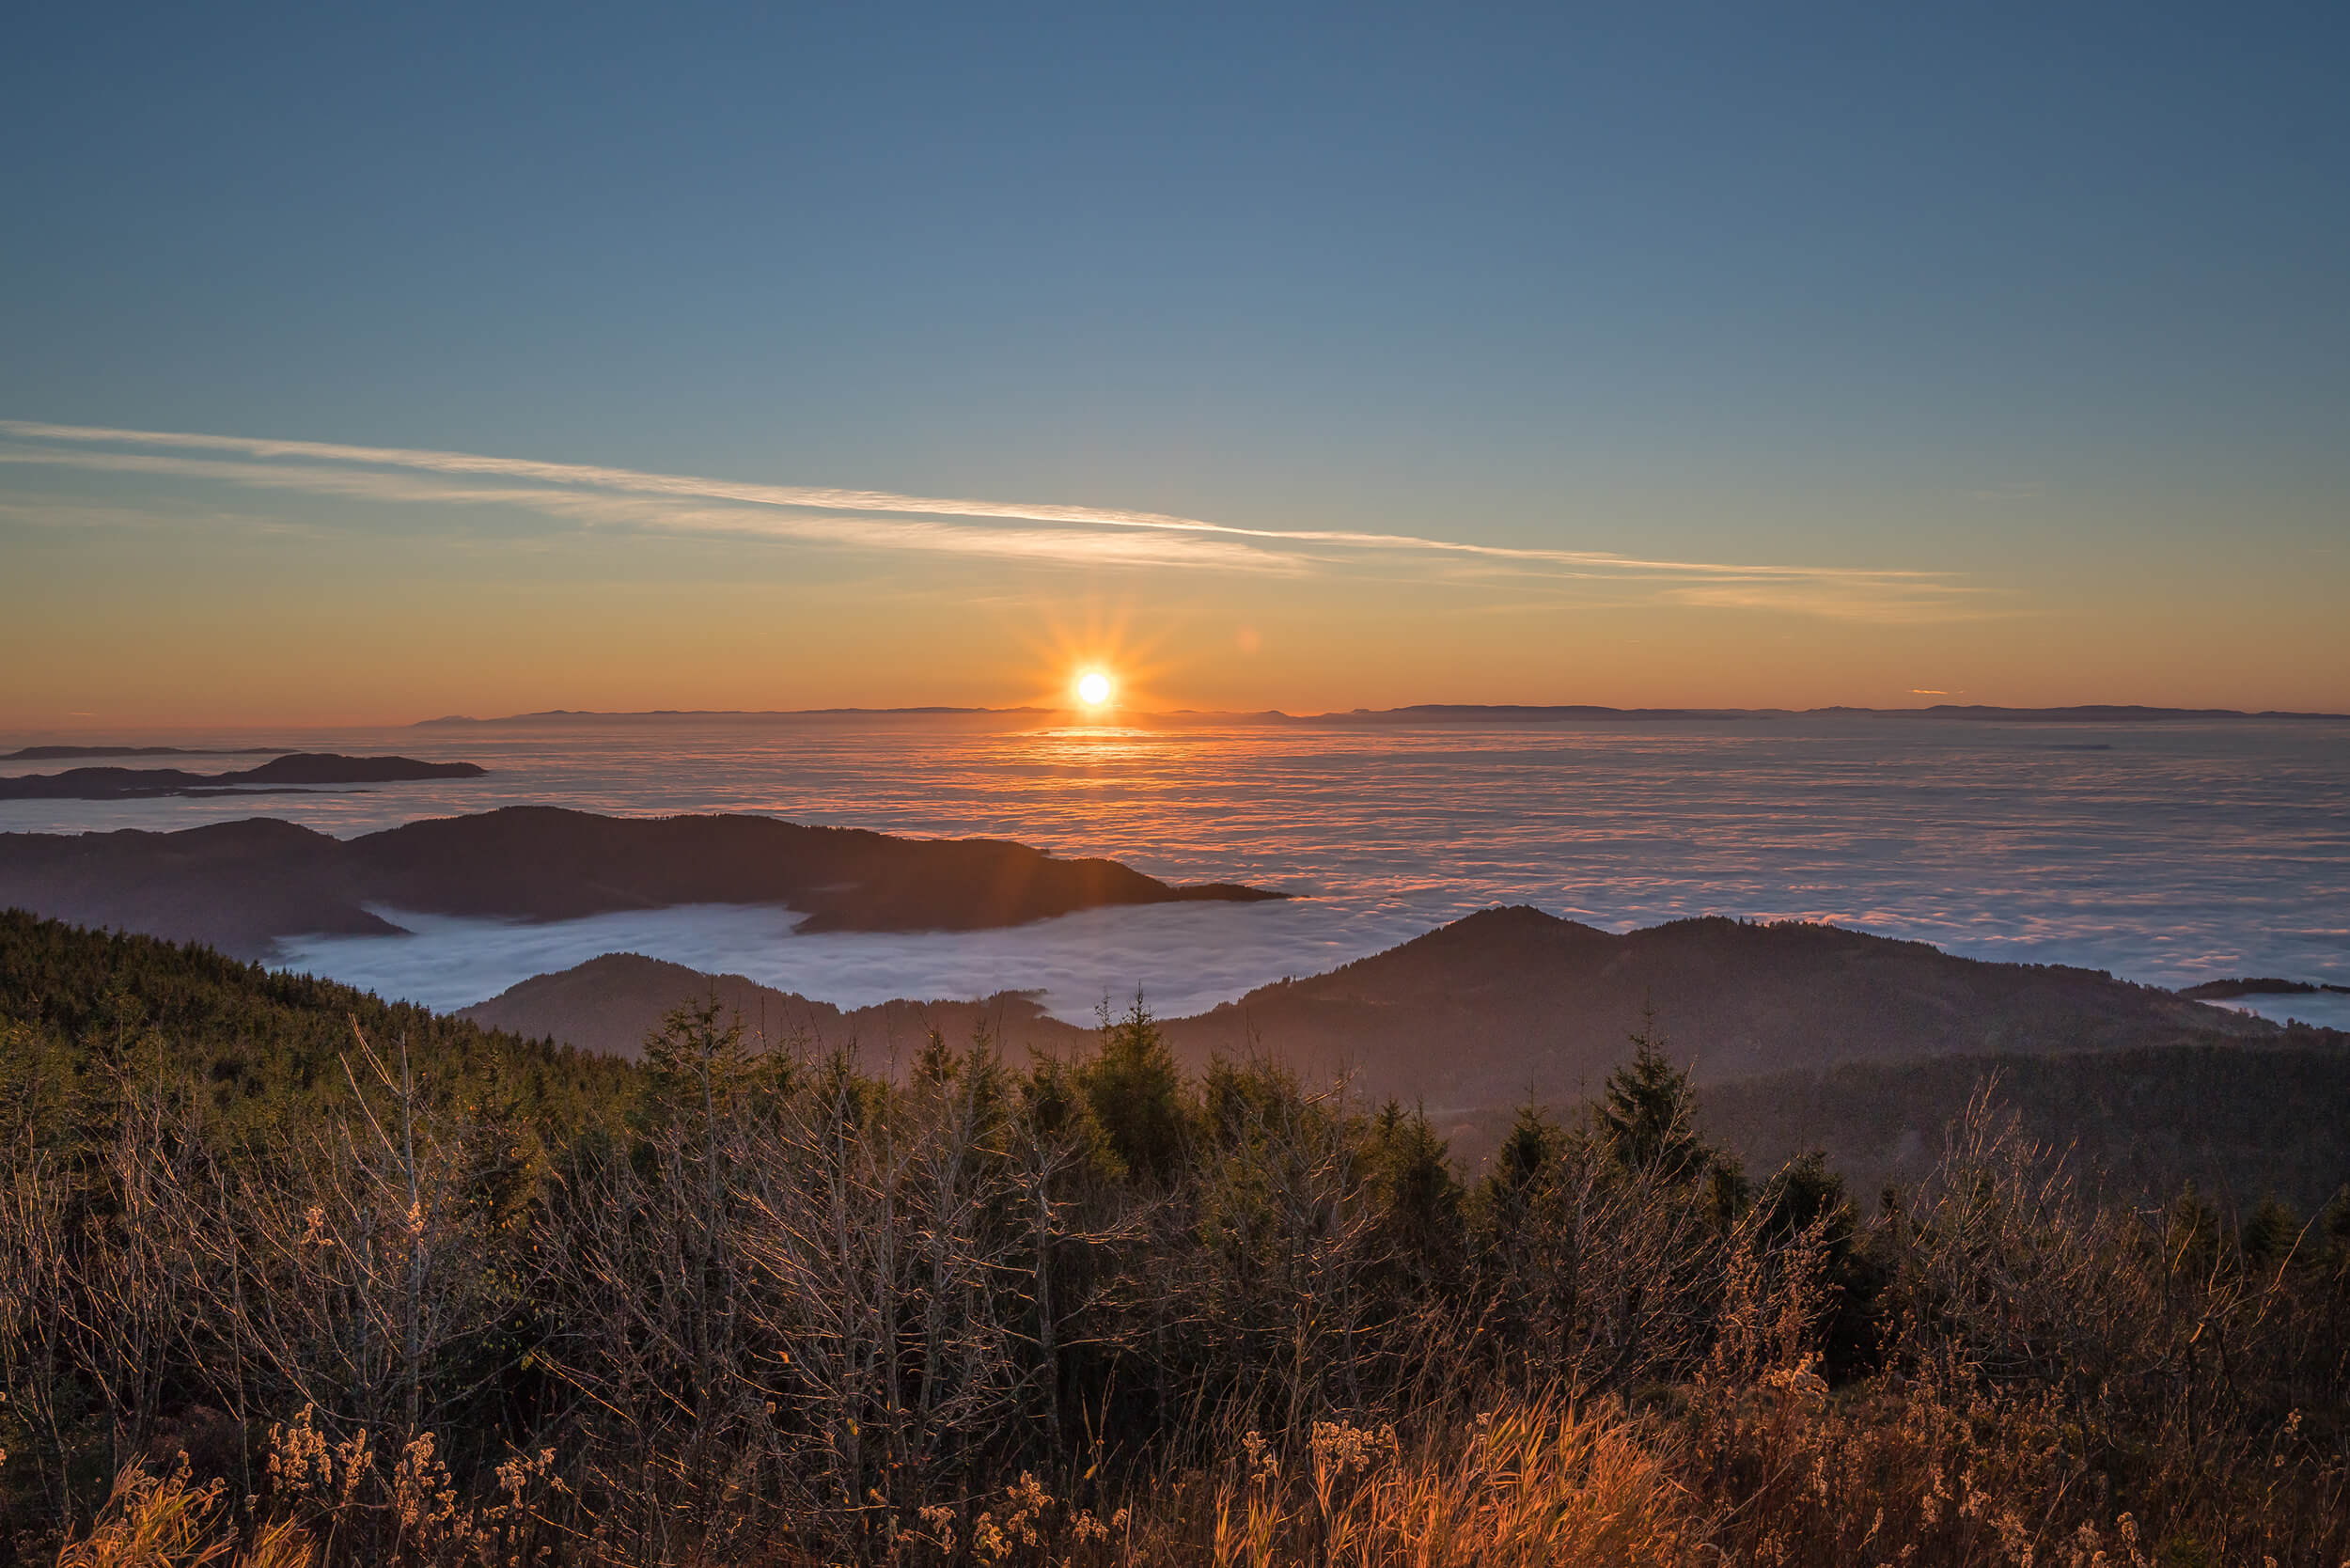 Hornisgrinde Sonnenuntergang